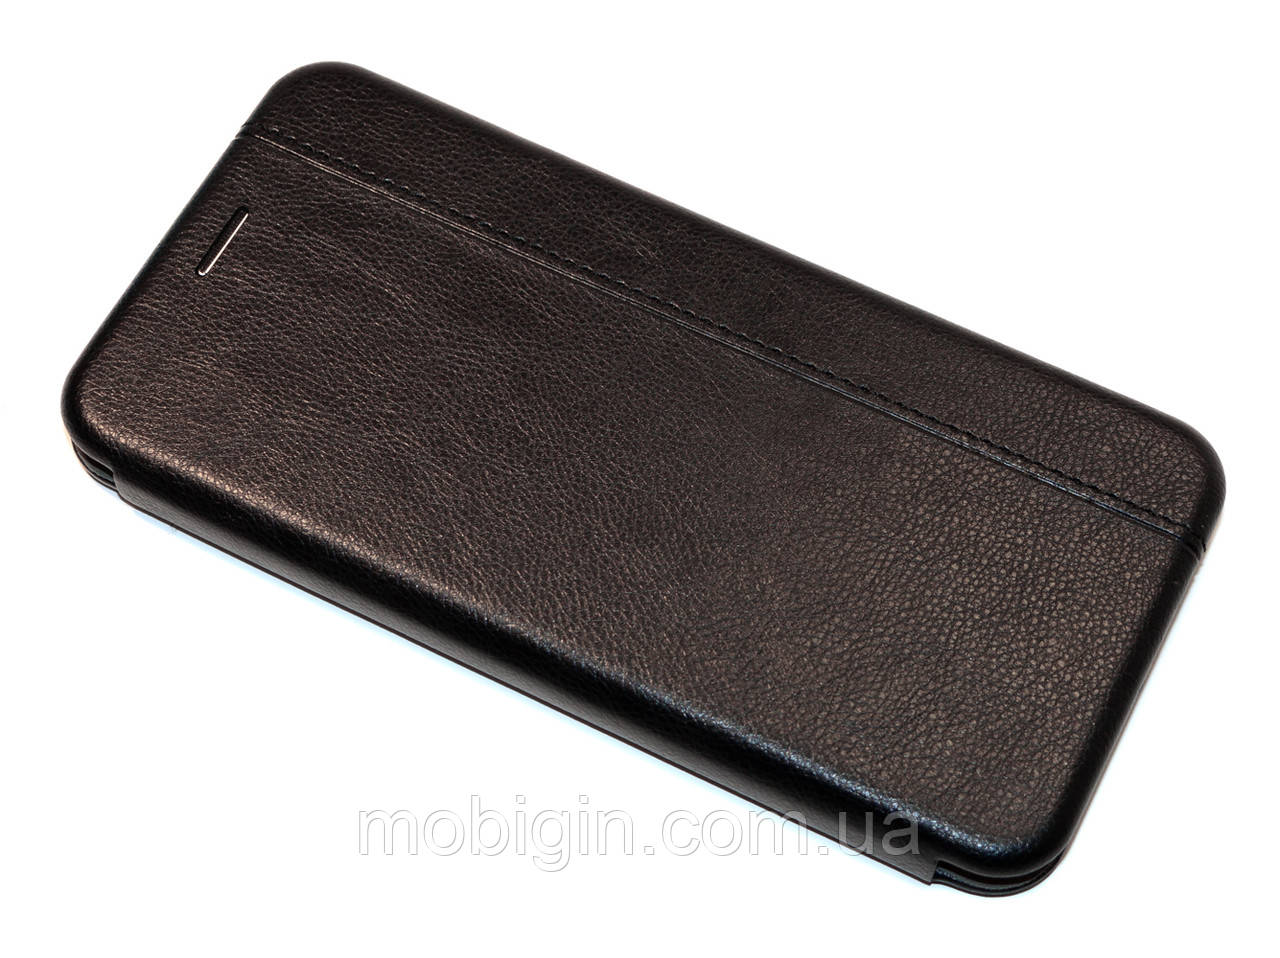 Чехол-книжка Samsung A750/A7 2018 черный Gelius Leather Book Cover